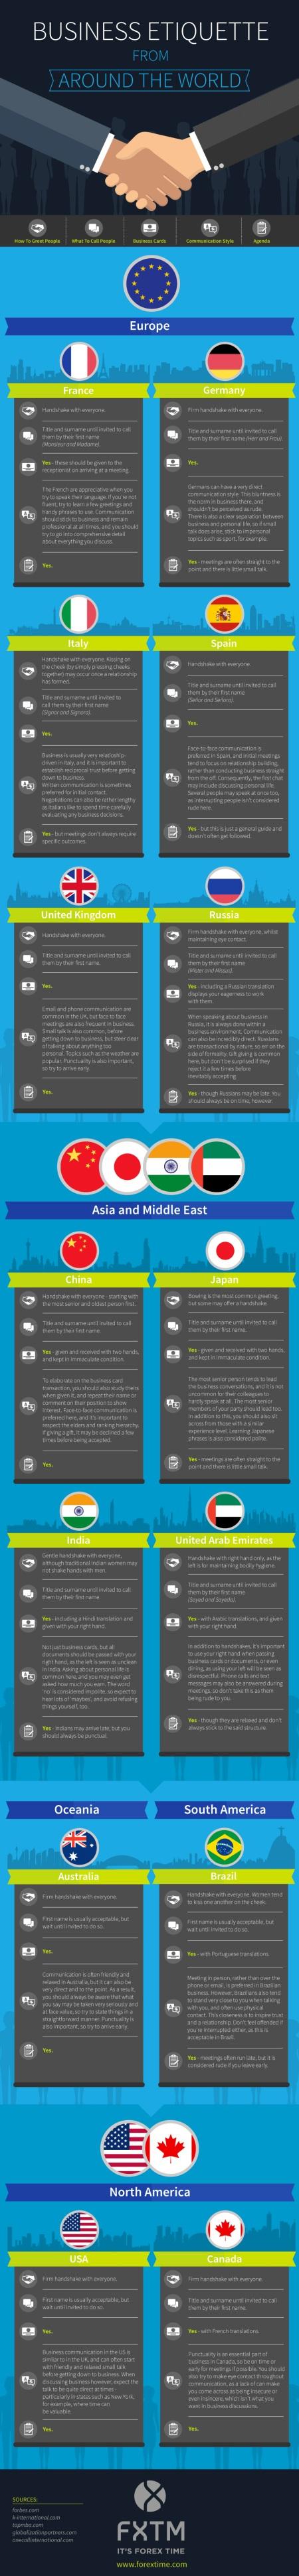 1479924648_business-etiquette-infographic